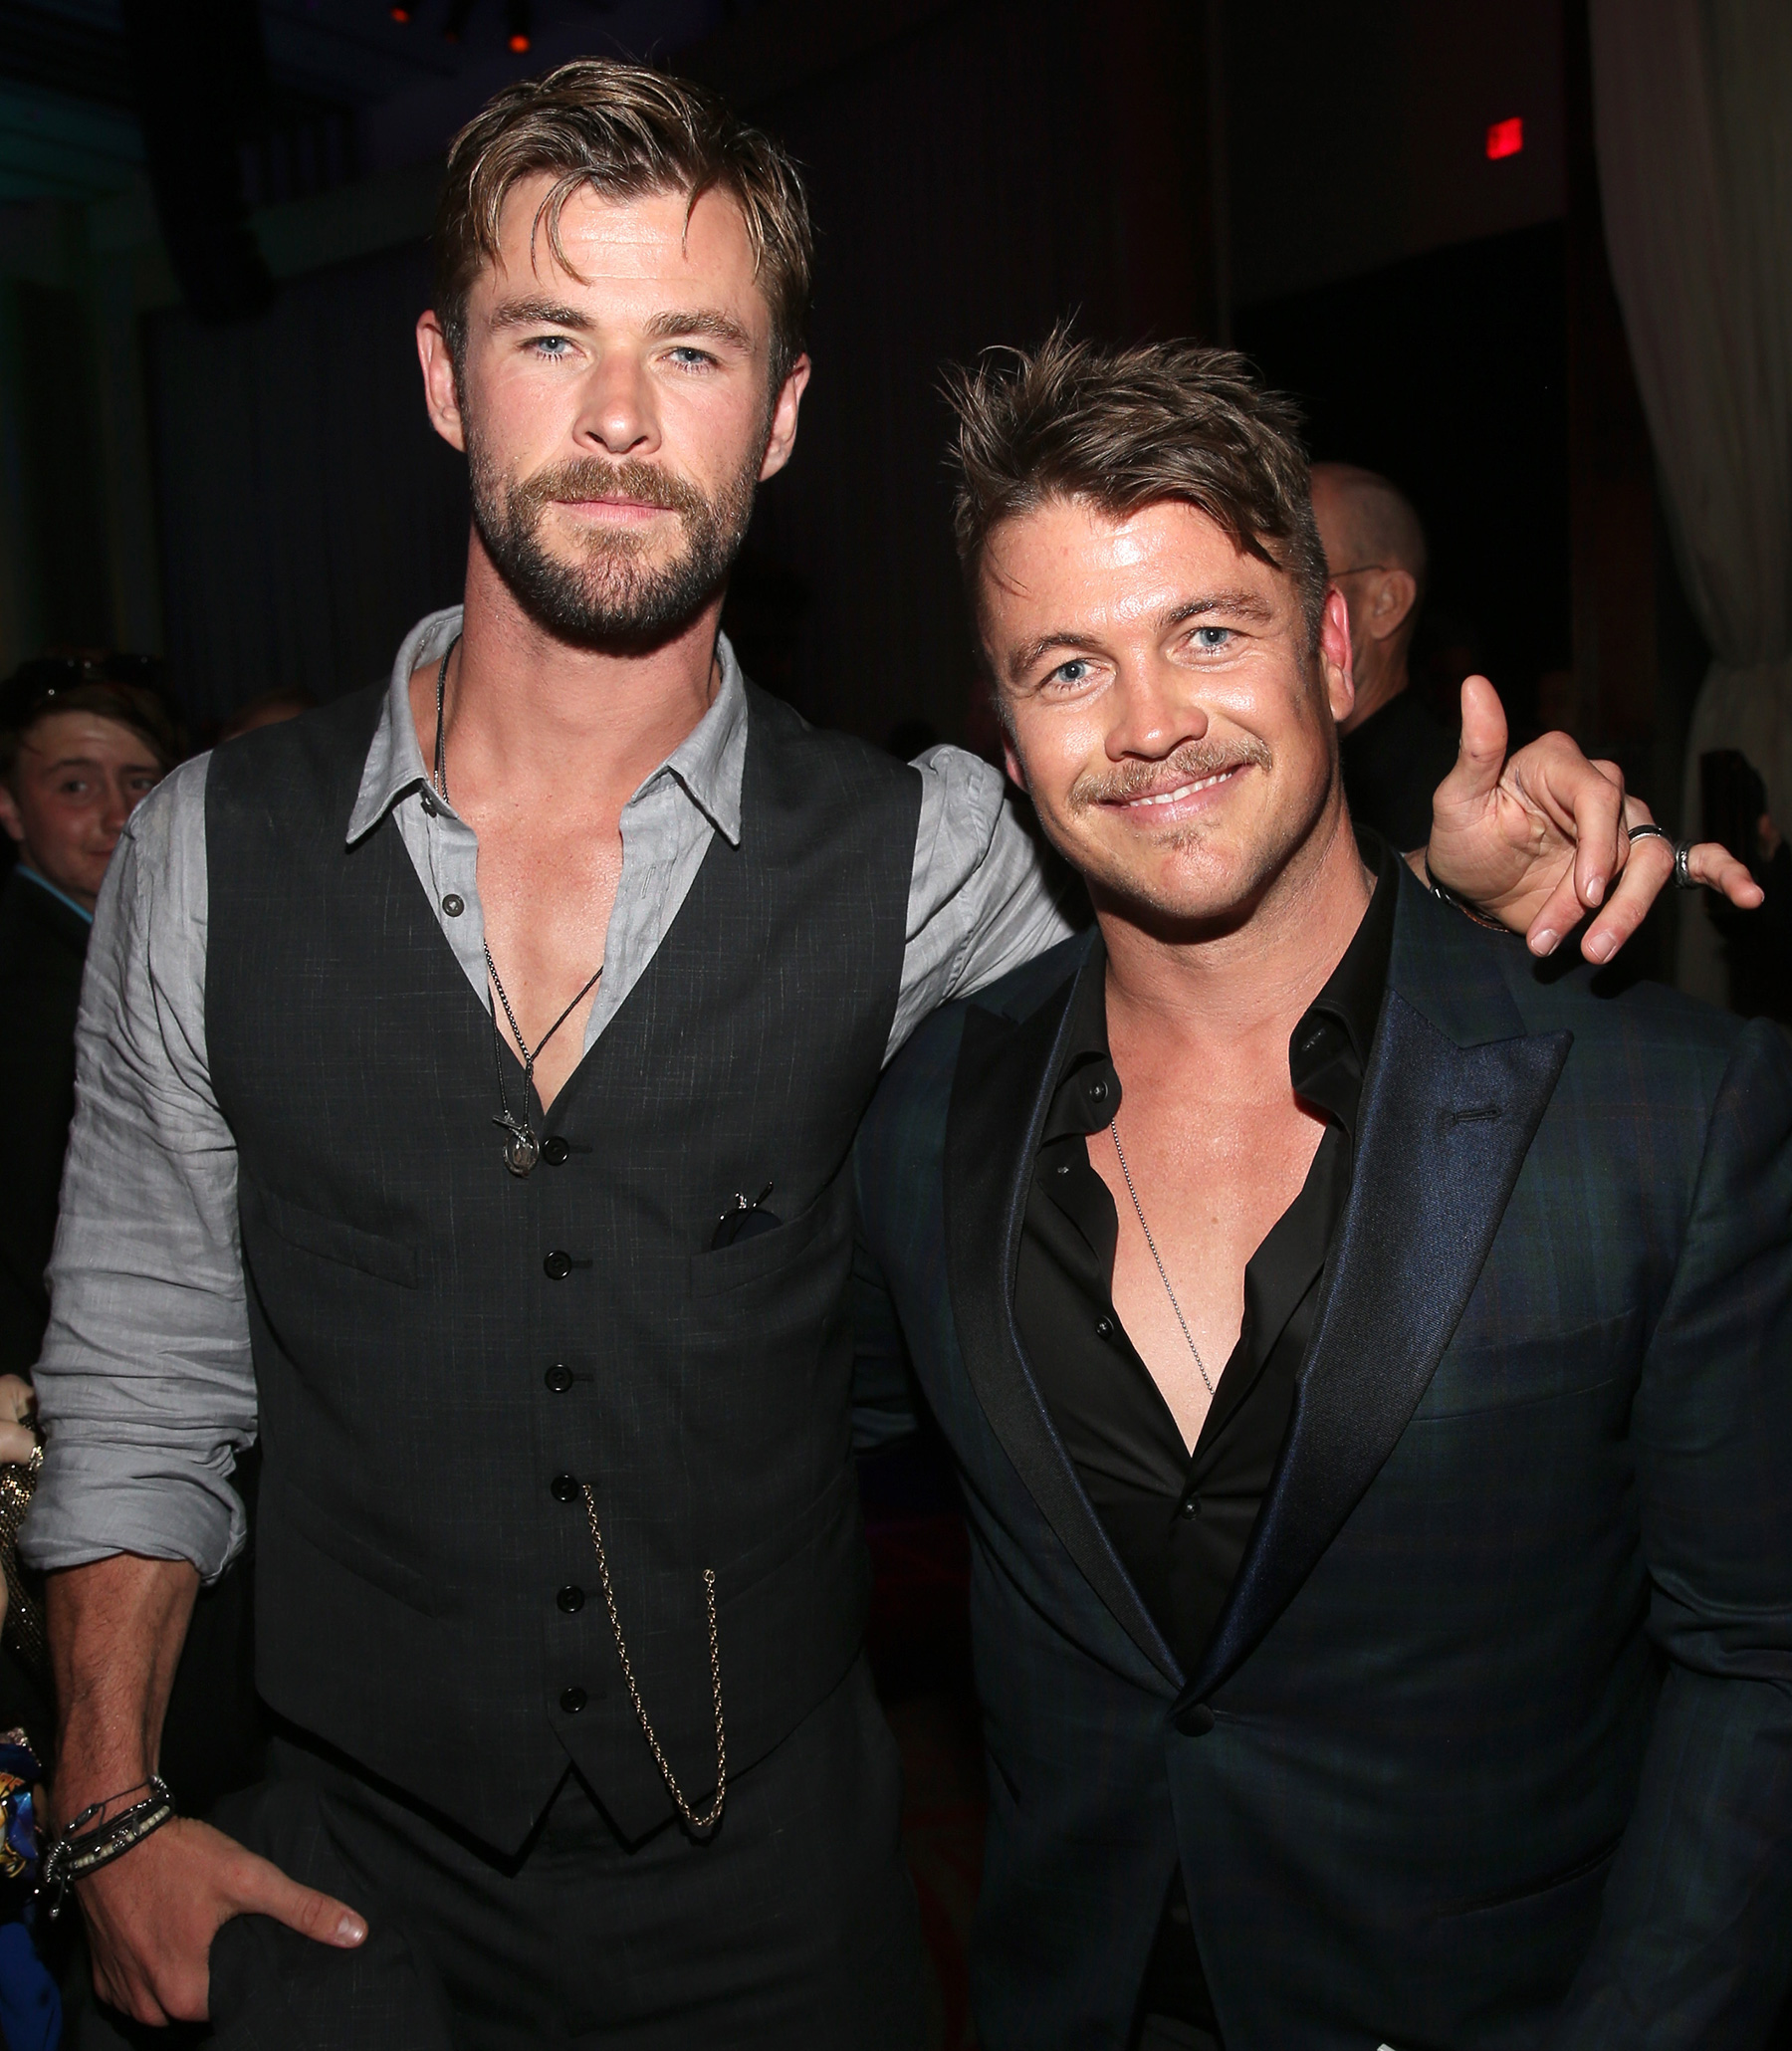 Chris Hemsworth és Luke Hemsworth